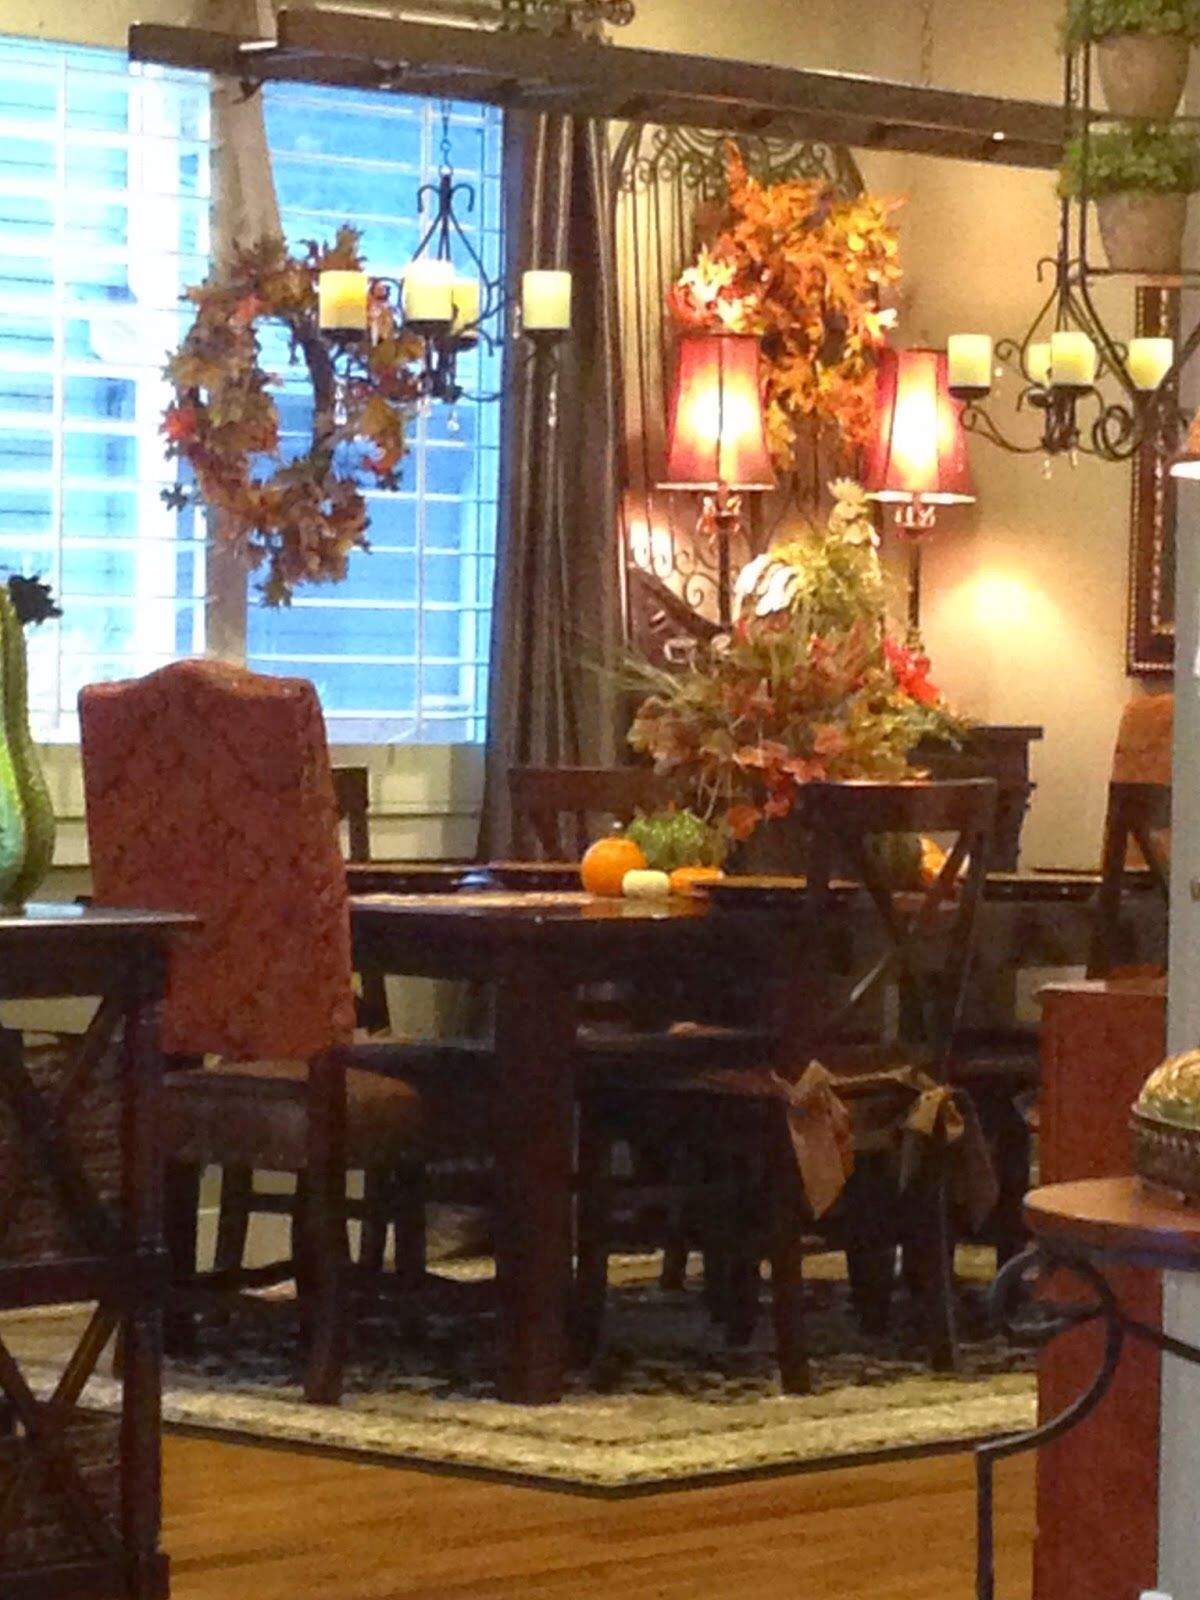 Fall Interior Decorating Ideas 2019 Mediterranean Fall tuscan decor   Savvy Seasons by Liz & The Tuscan Home by Liz